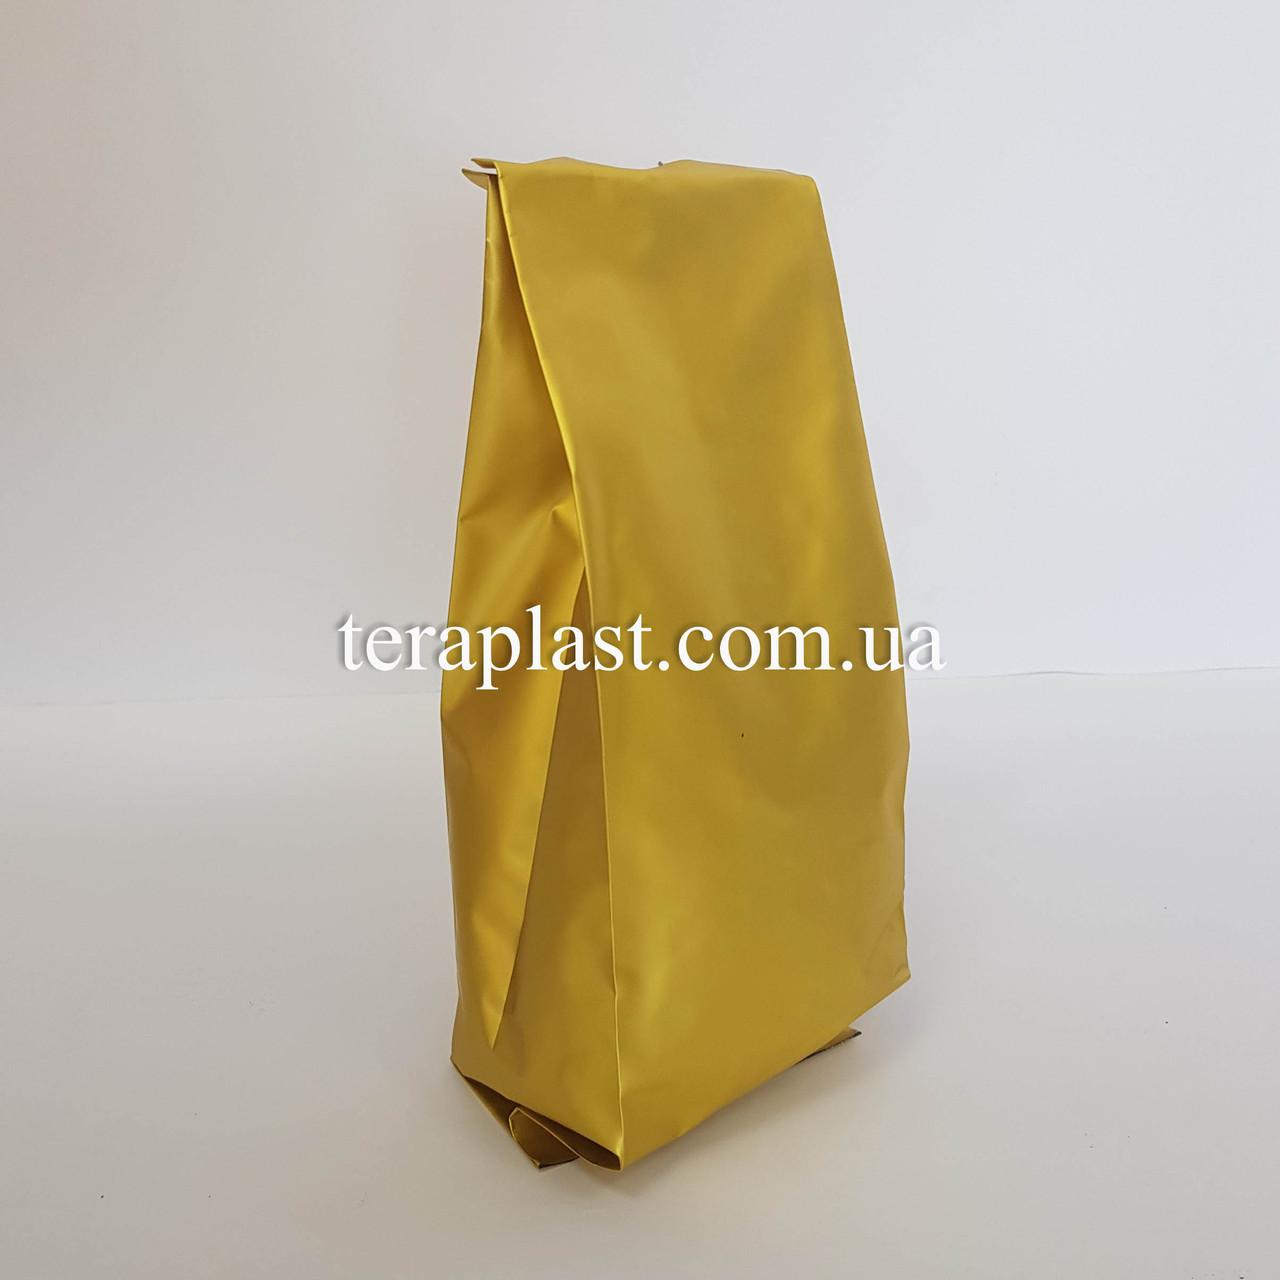 Гассет-пакет с центральным швом золото 250г 80х250х32